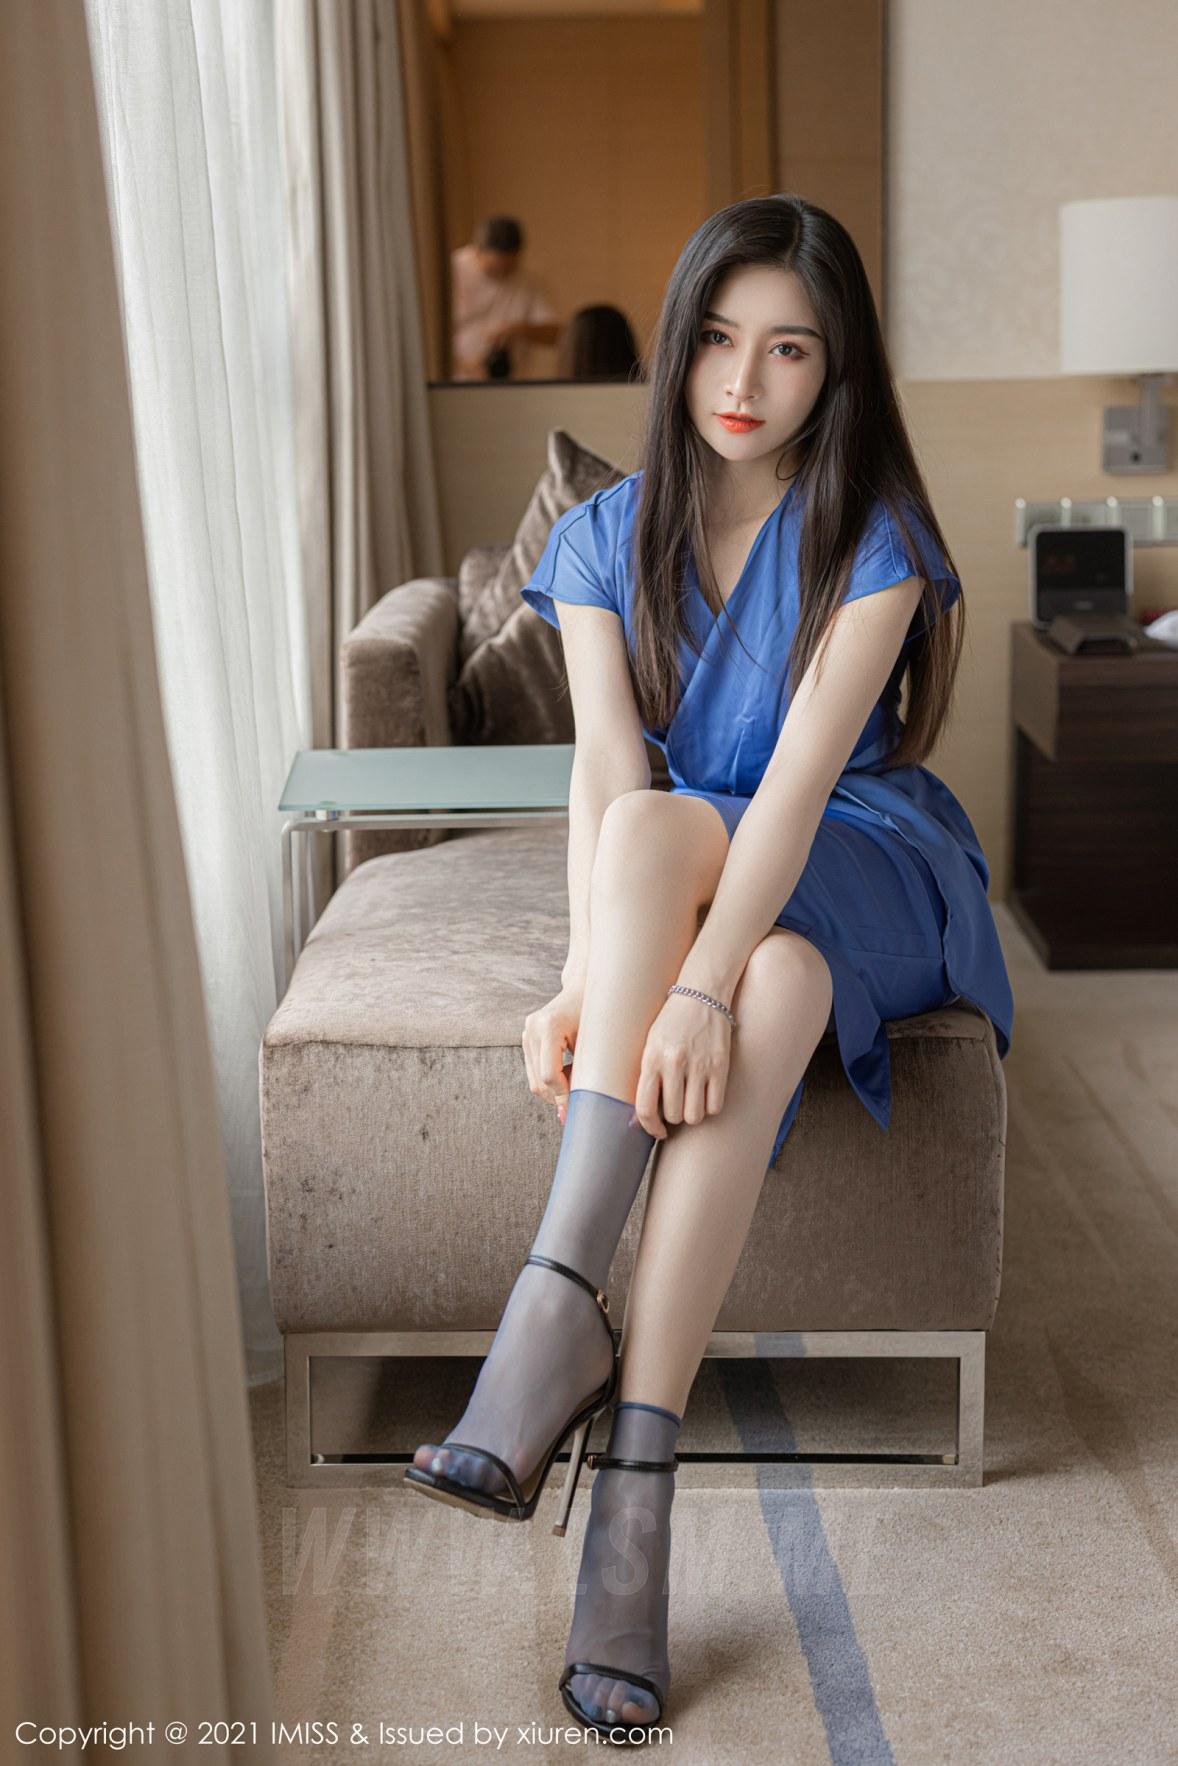 IMiss 爱蜜社 Vol.626 气质美女多姿礼裙 Vanessa 性感写真3 - 2